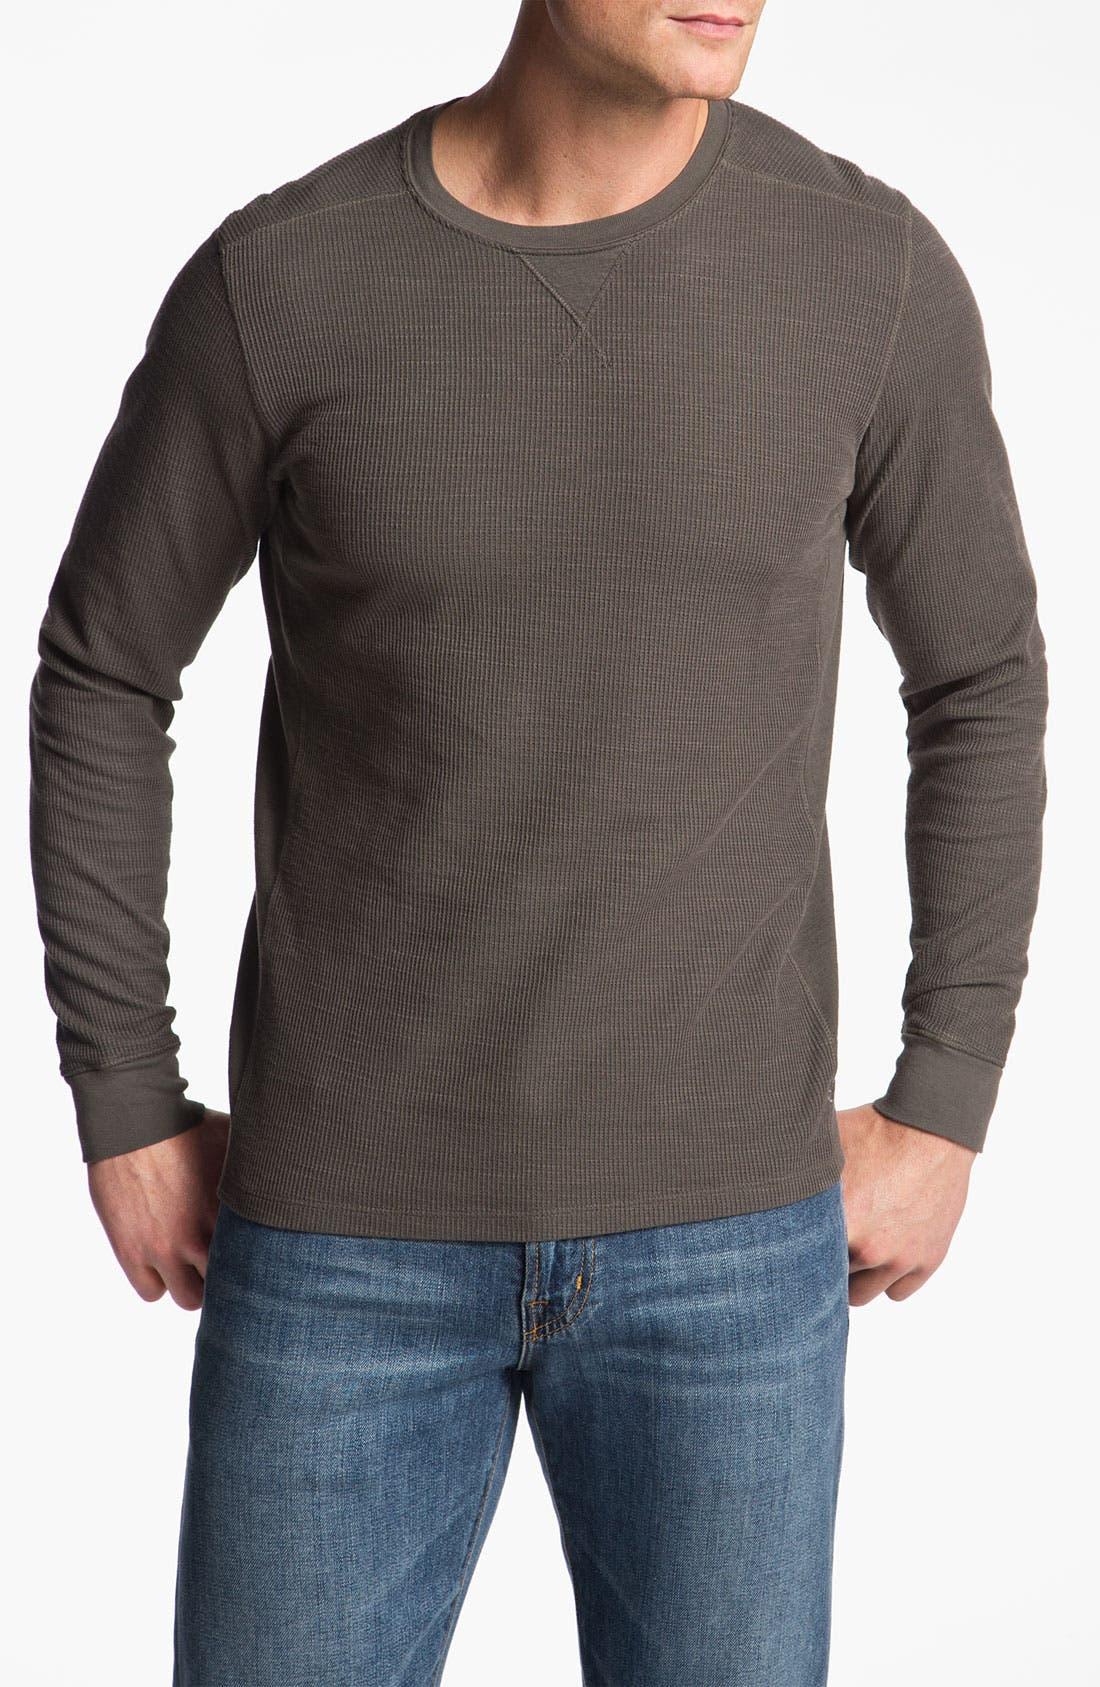 Alternate Image 1 Selected - AG Jeans Long Sleeve Crewneck Thermal Shirt